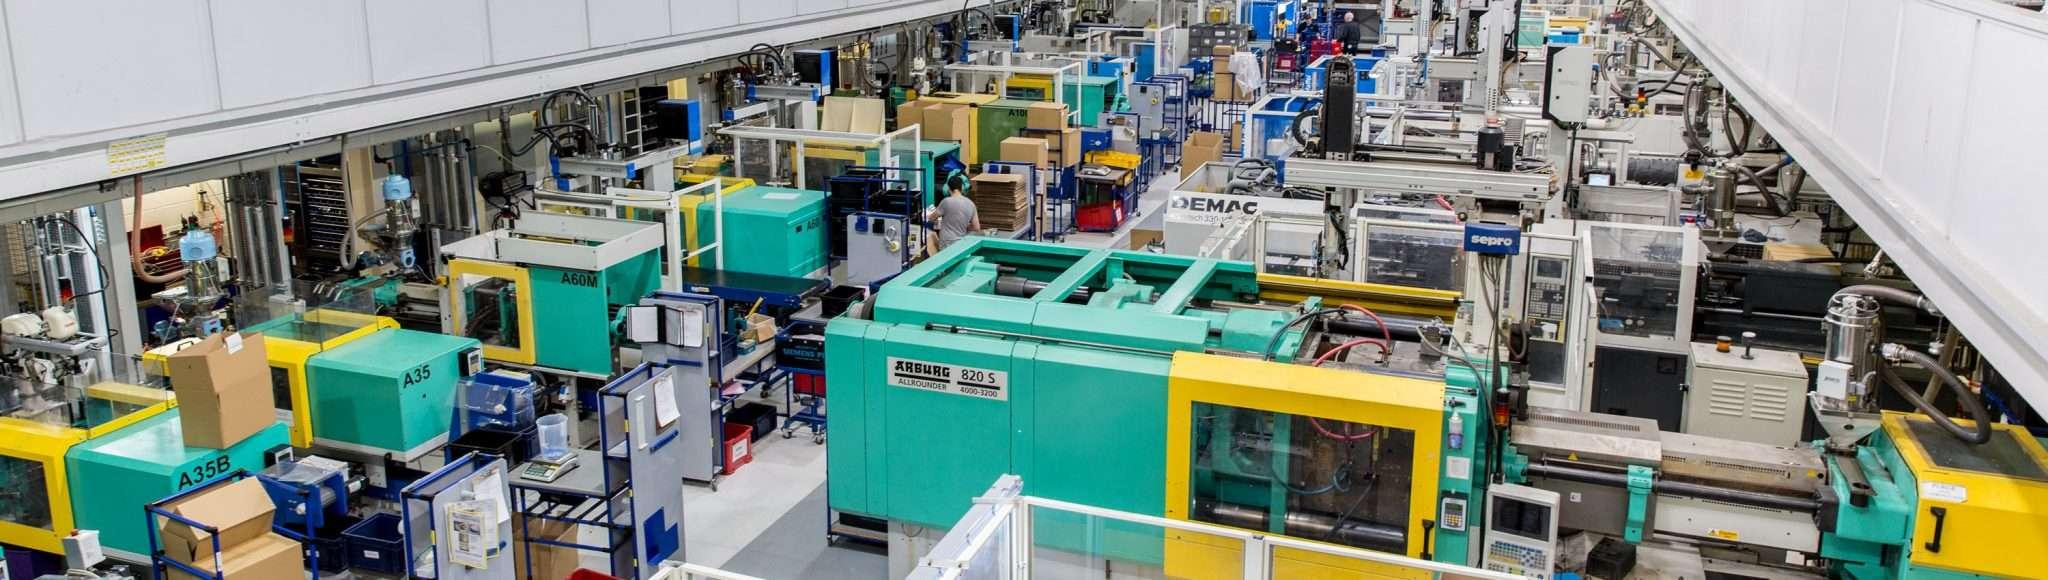 OGM Factory Image